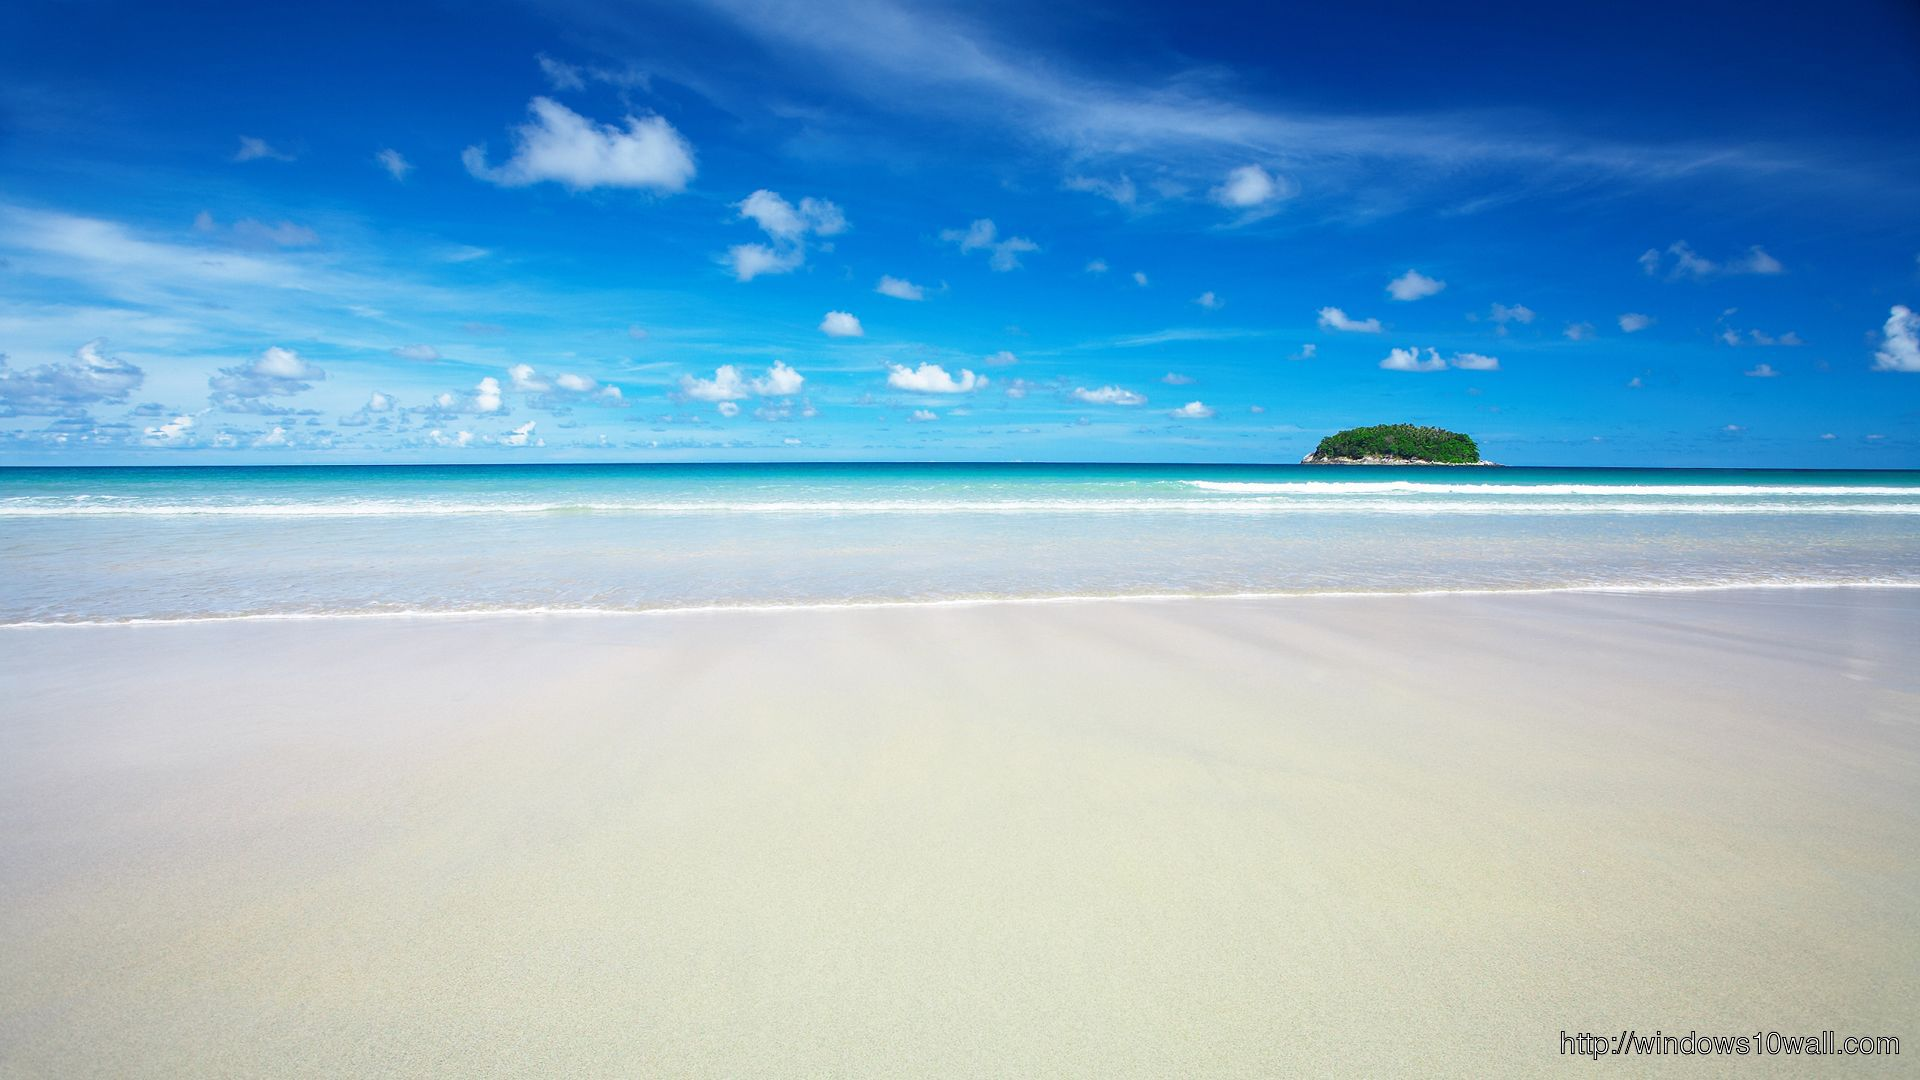 beach-background-wallpaper-download